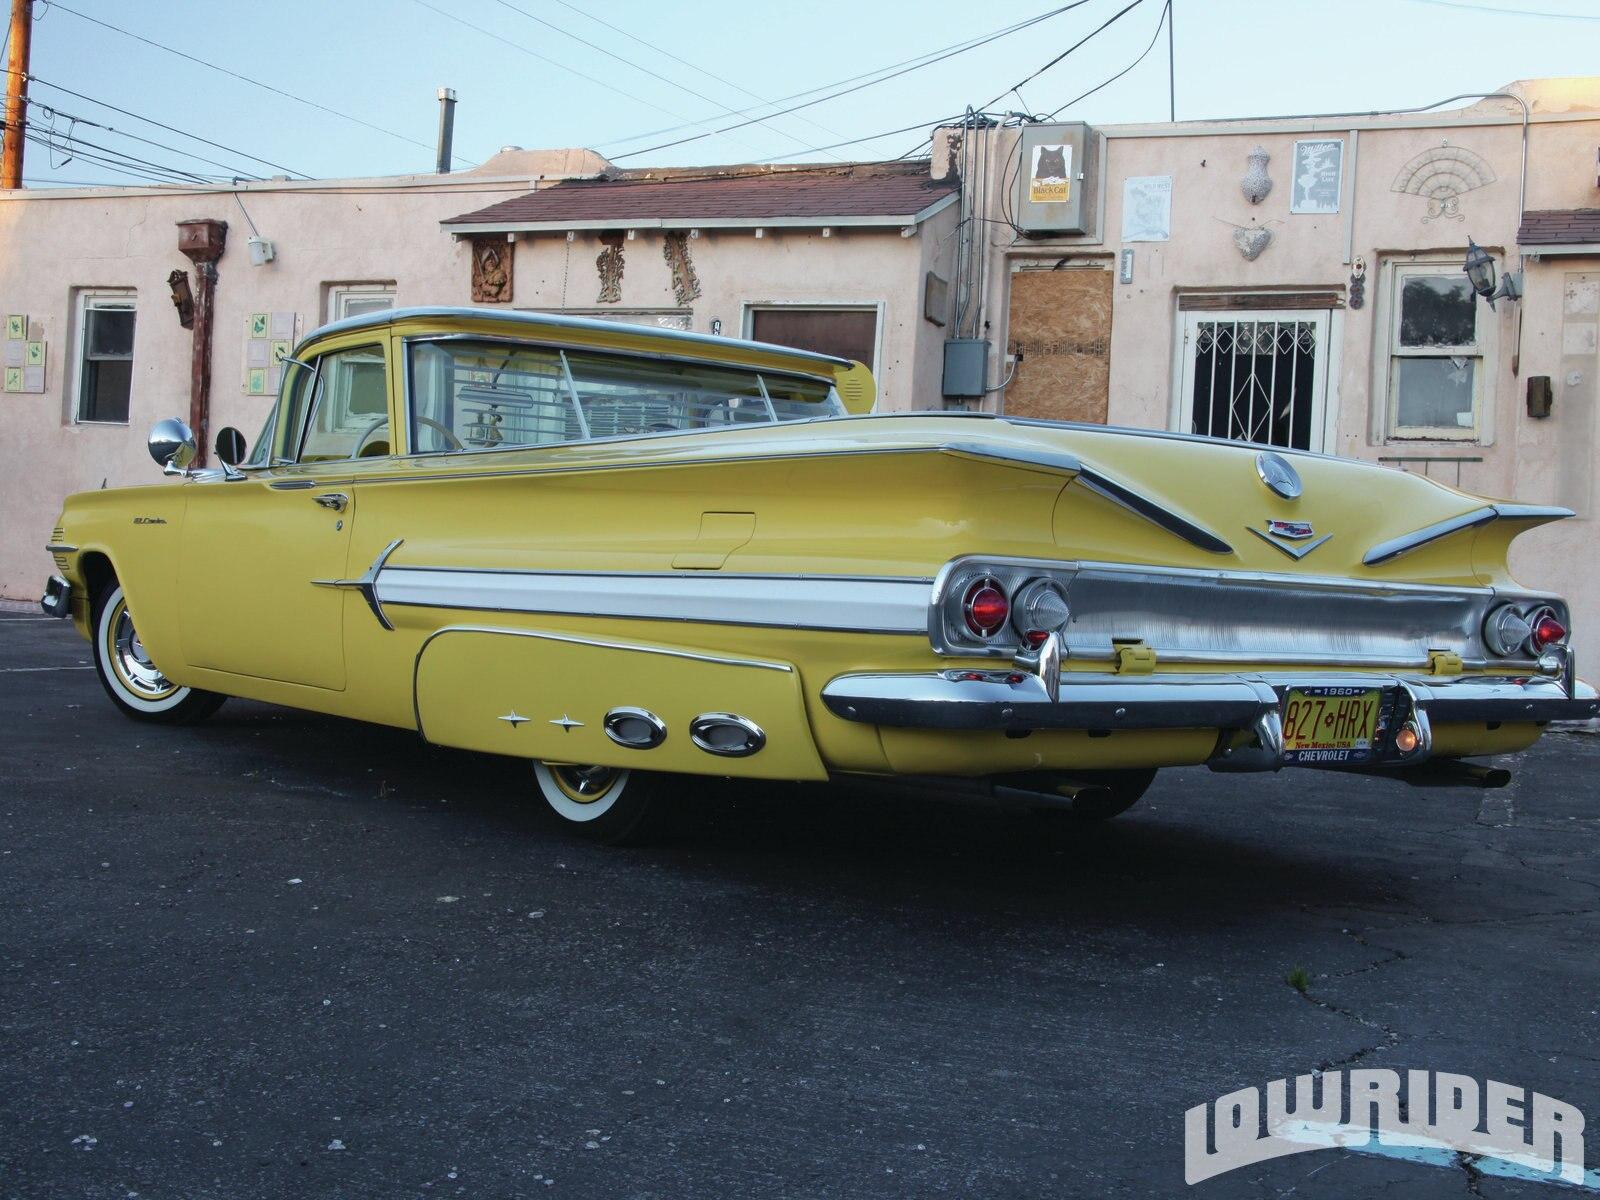 1964 Impala Lowrider For Sale Craigslist 2019 2020 New Car Price Ss Wiring Diagram 1960 Chevy El Camino Ebay